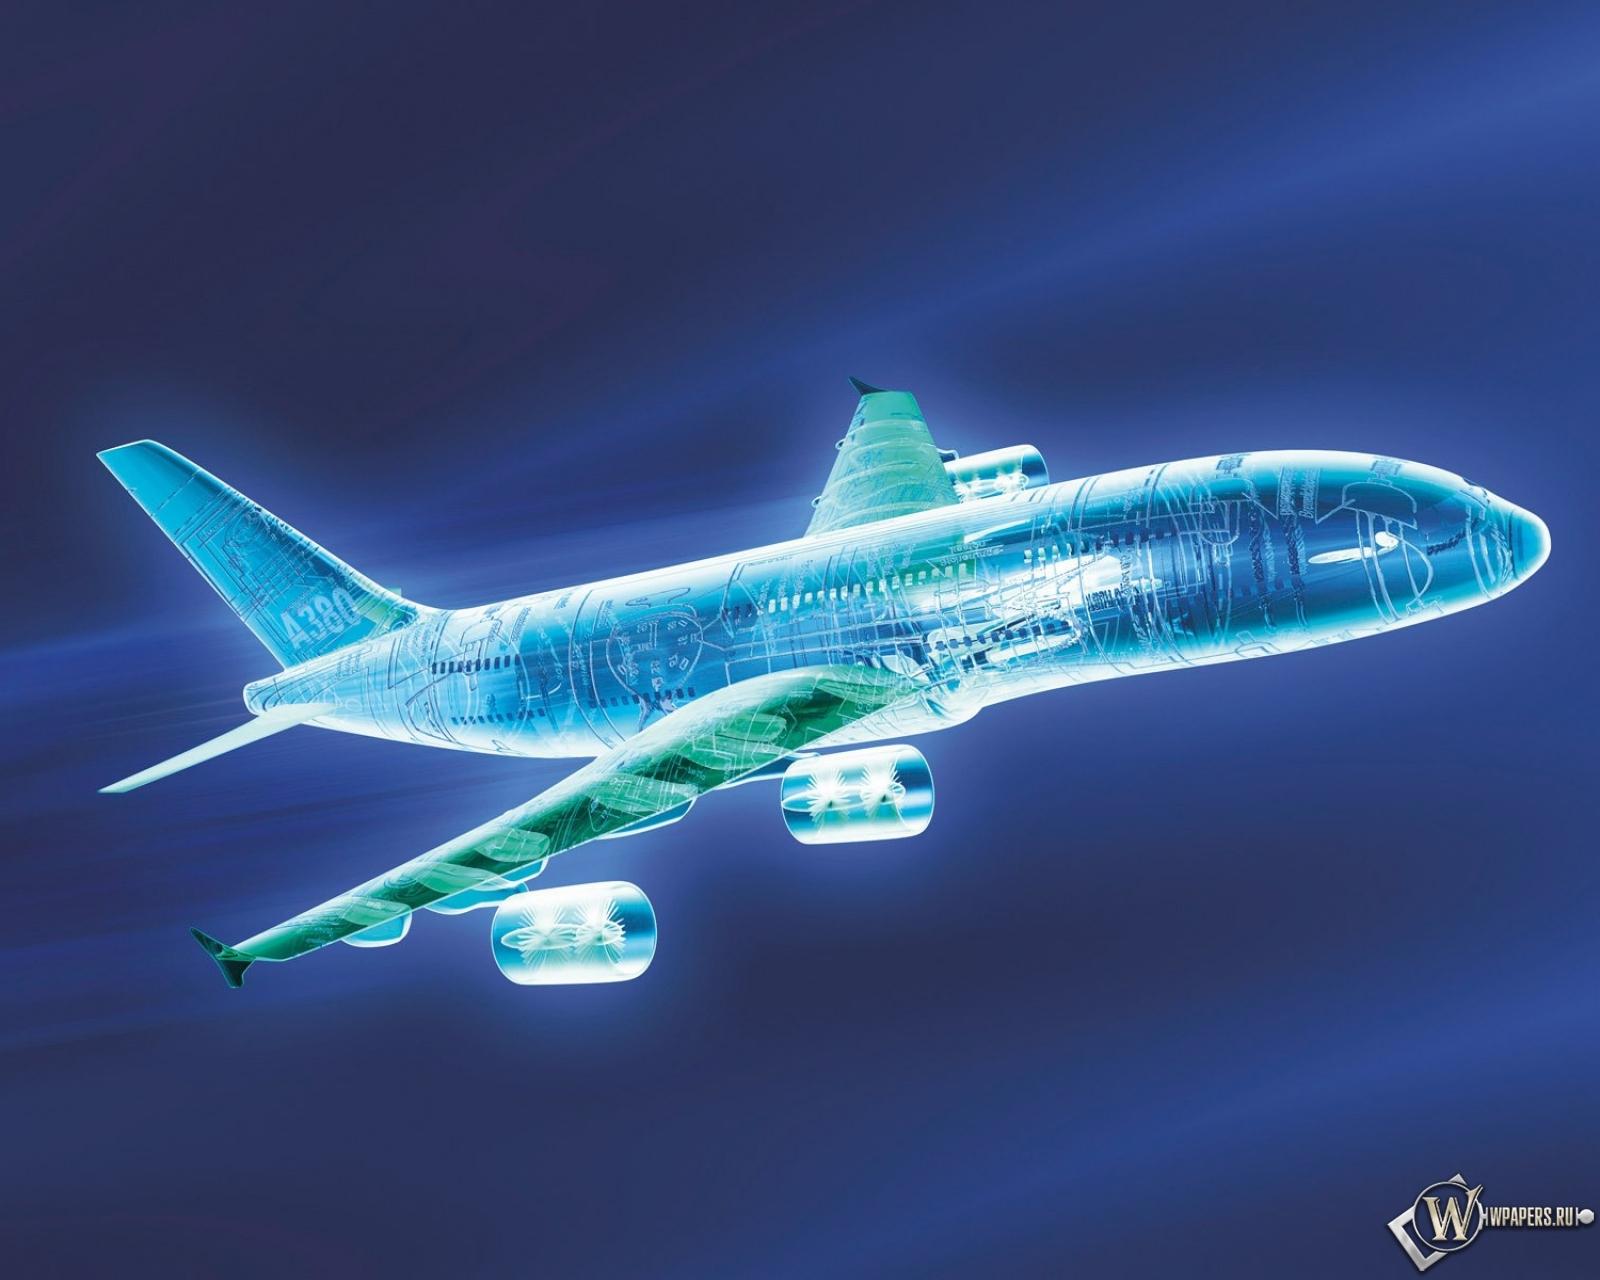 Эскиз самолета 1600x1280: wpapers.ru/wallpapers/3d/63/1600-1280_Эскиз-самолета.html